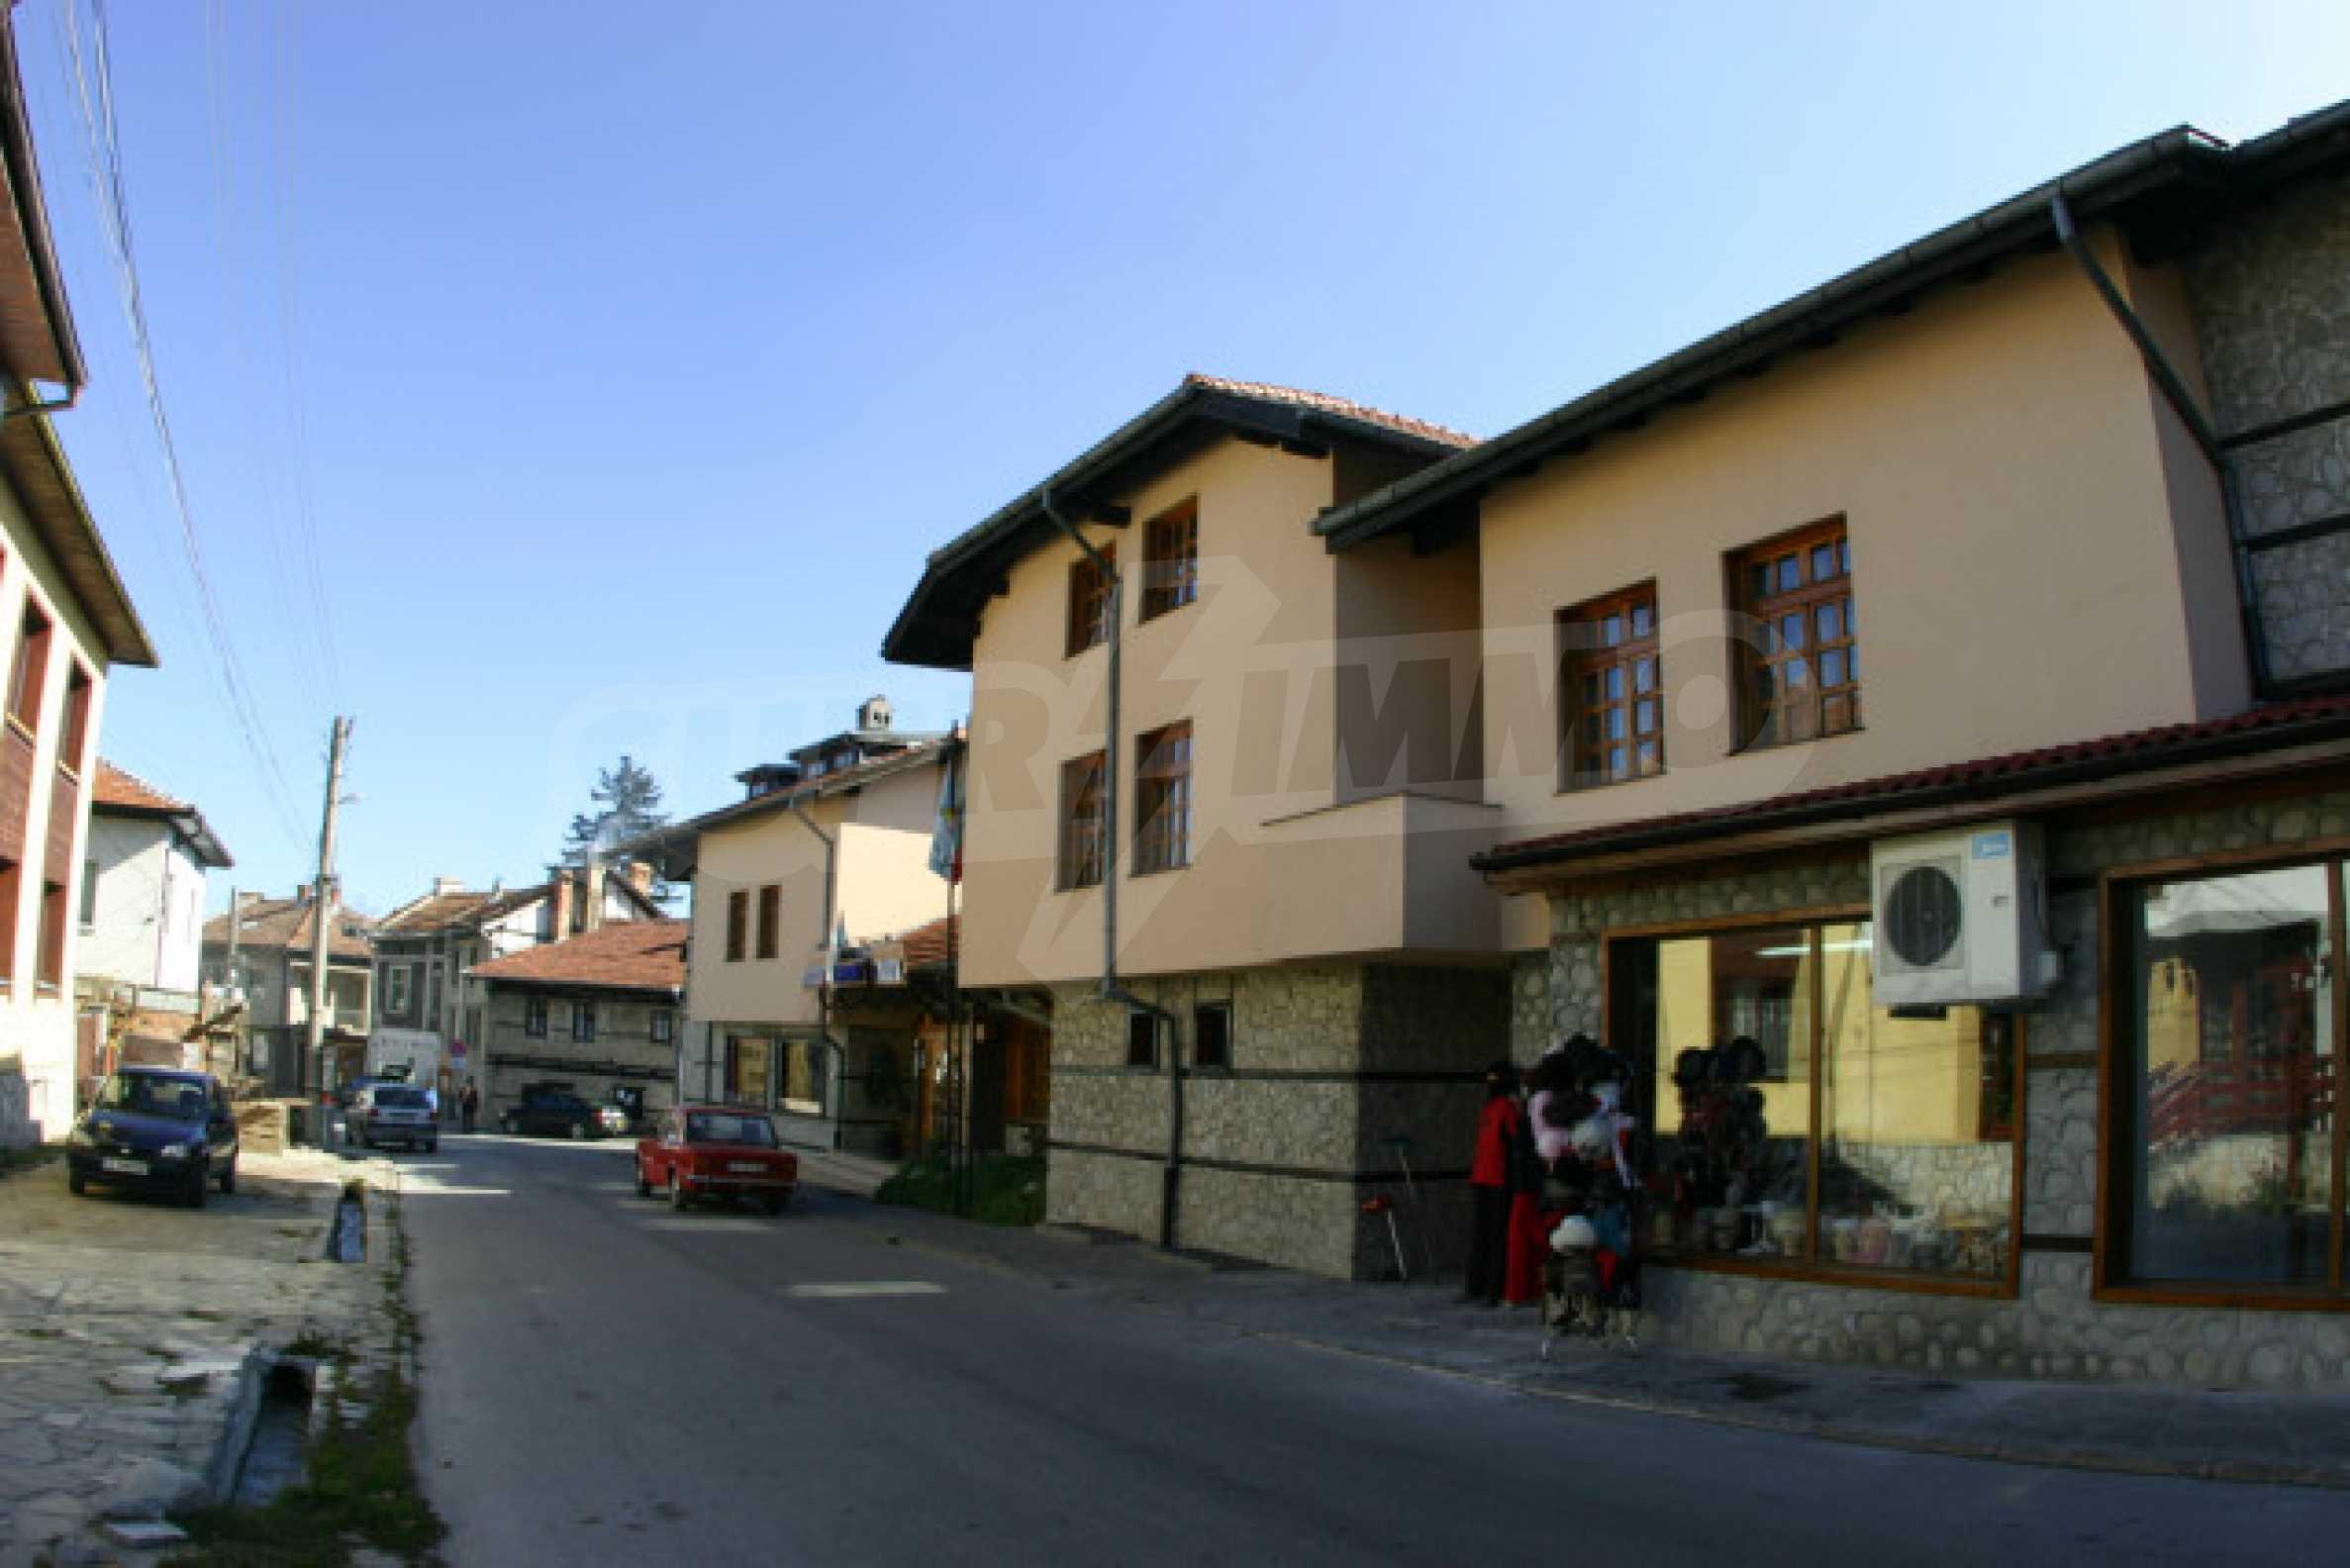 Hotel on the main shopping street of Bansko 1